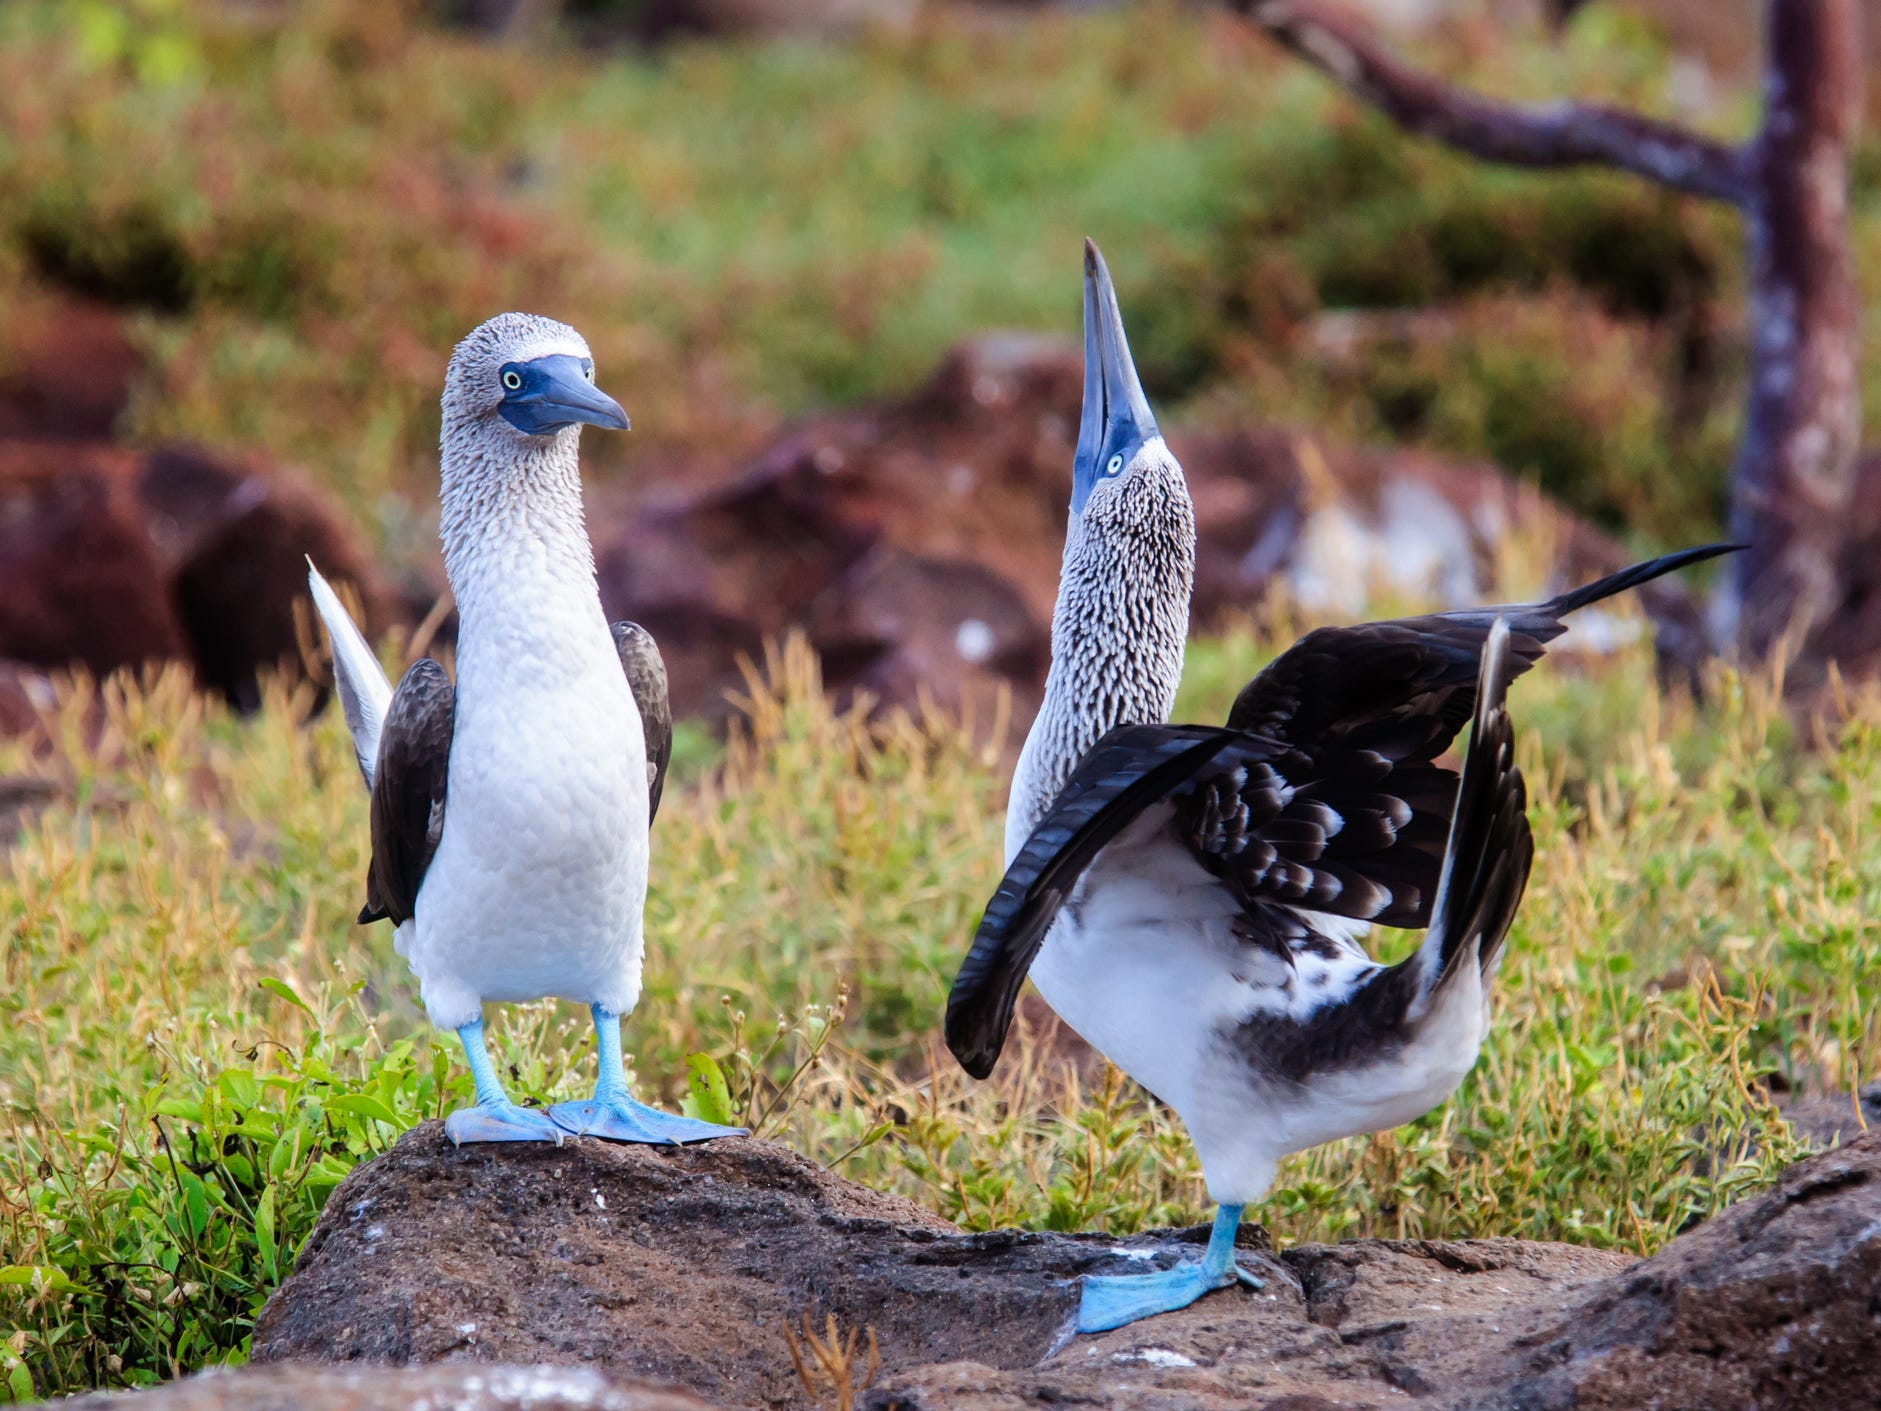 Blue-footed boobies in the Galapagos Islands, Ecuador.